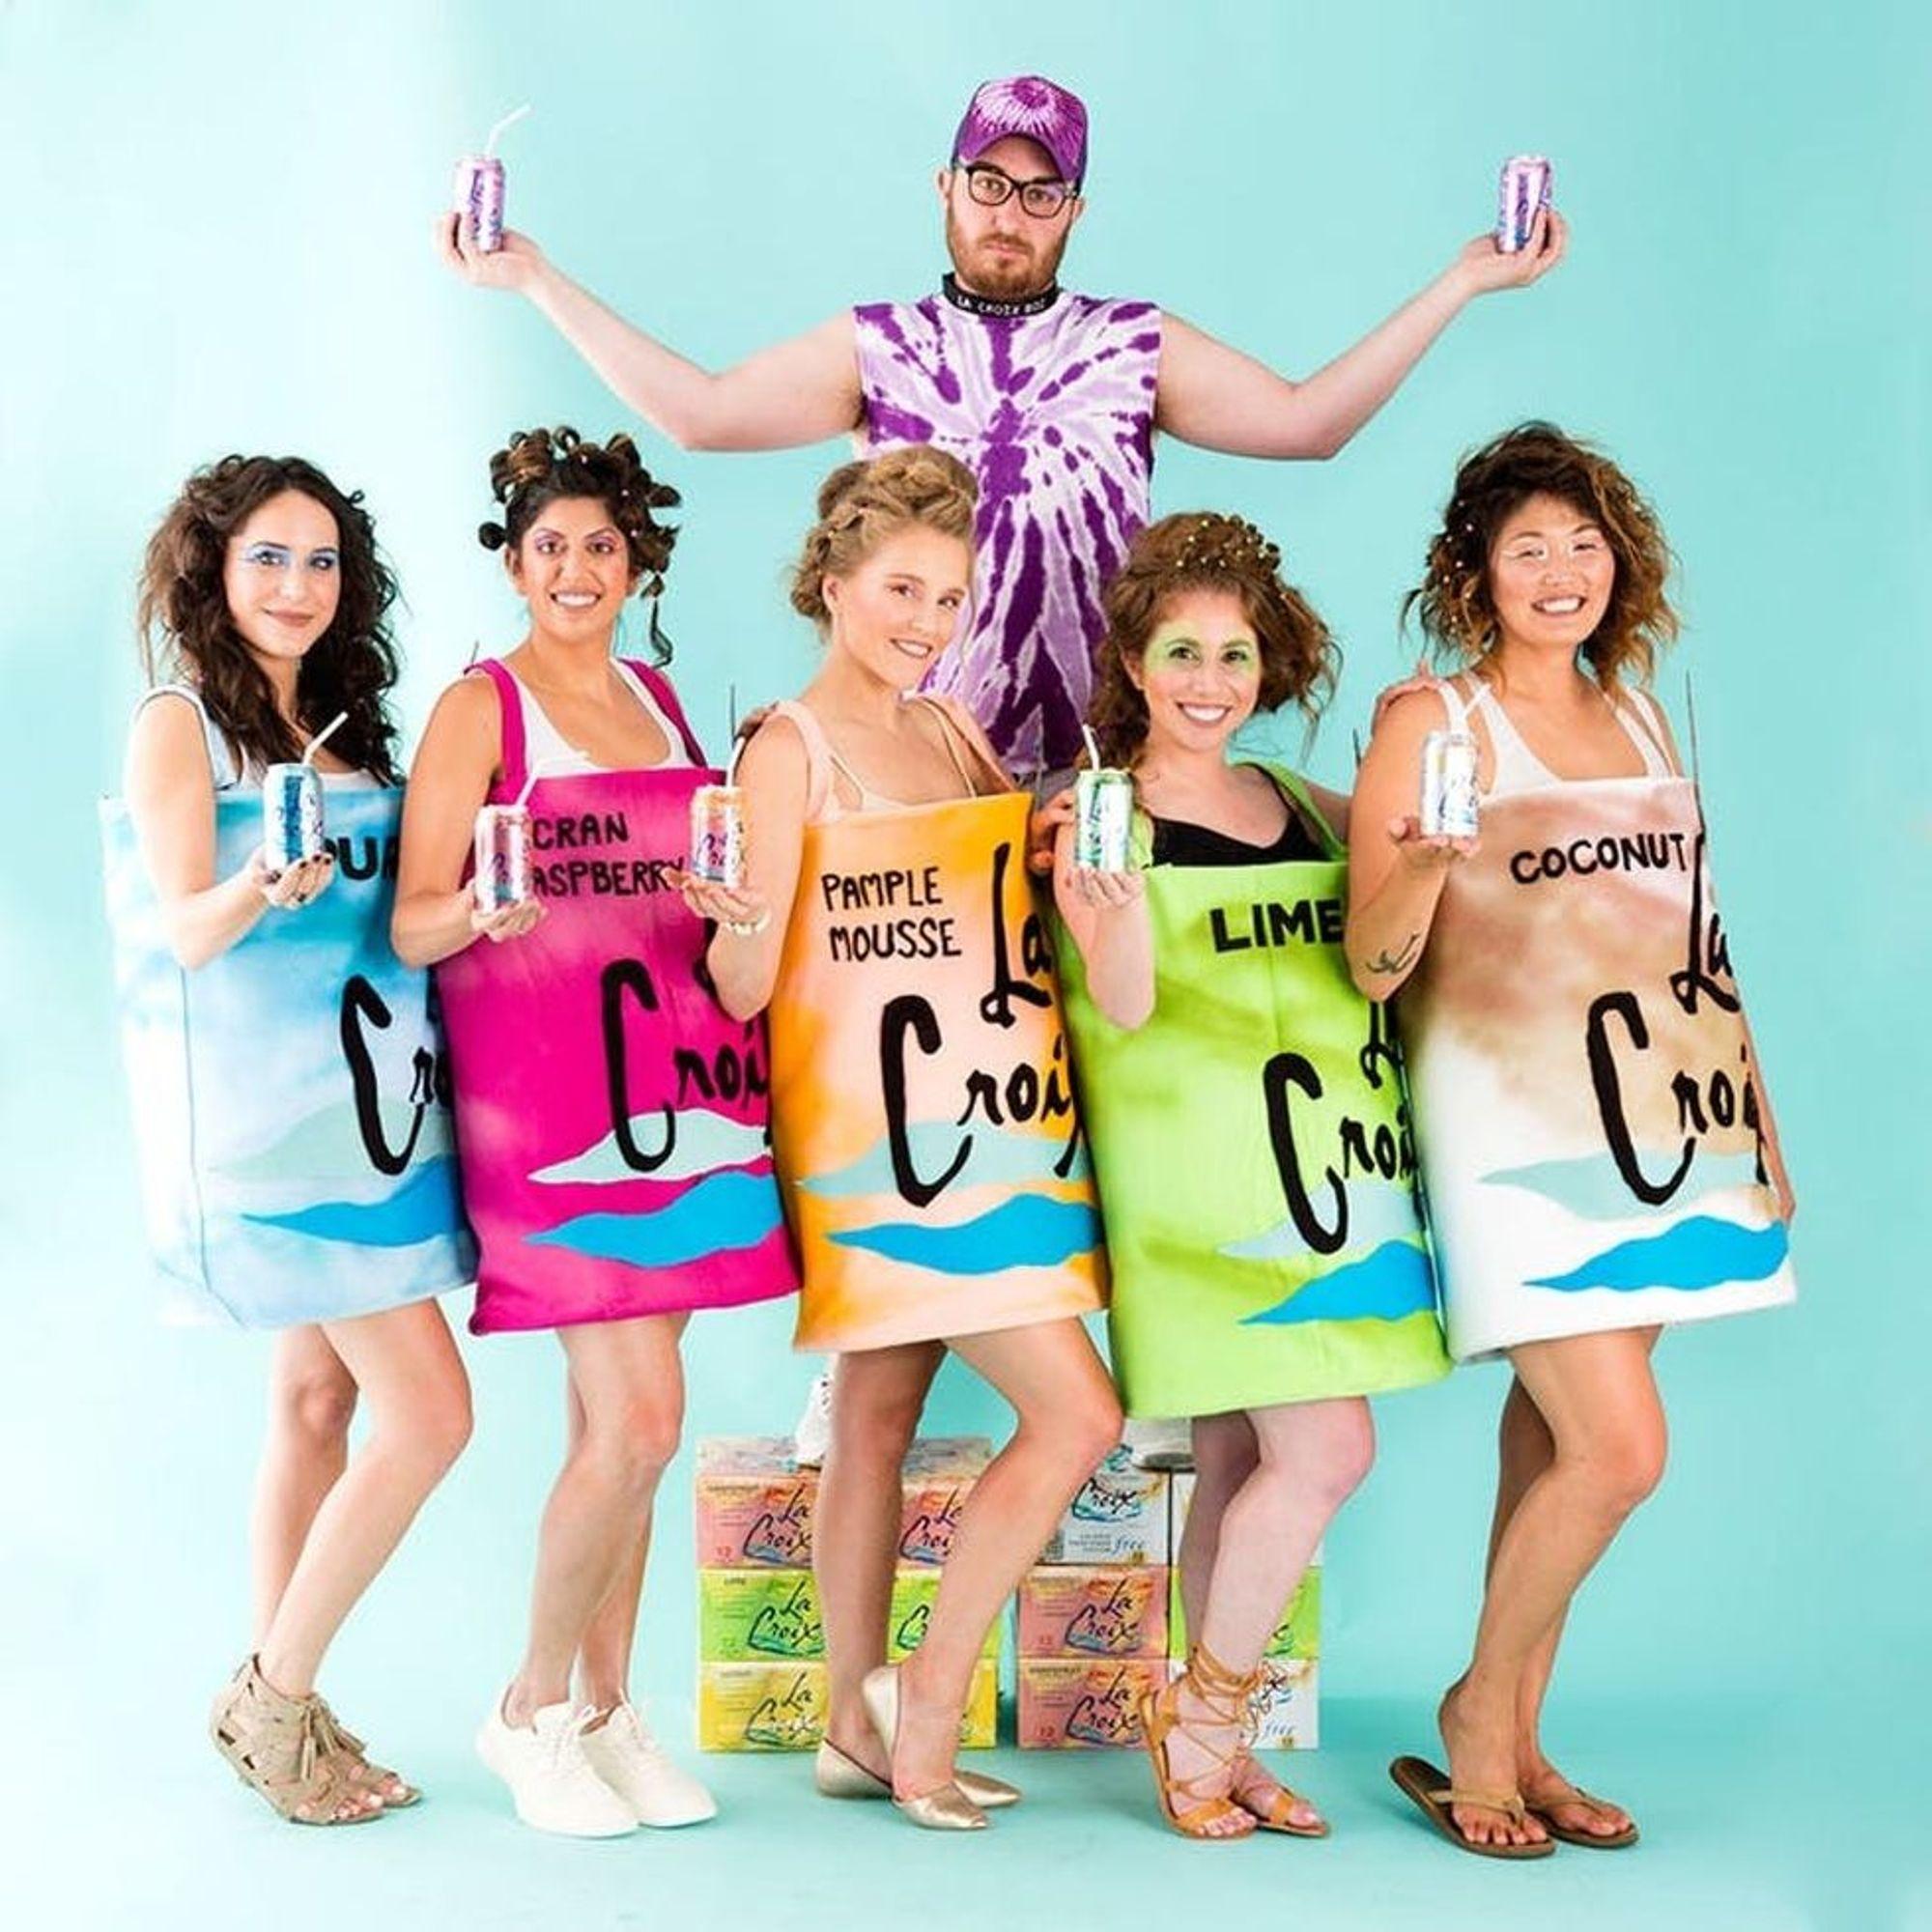 30 Winning Group Halloween Costume Ideas - Brit + Co